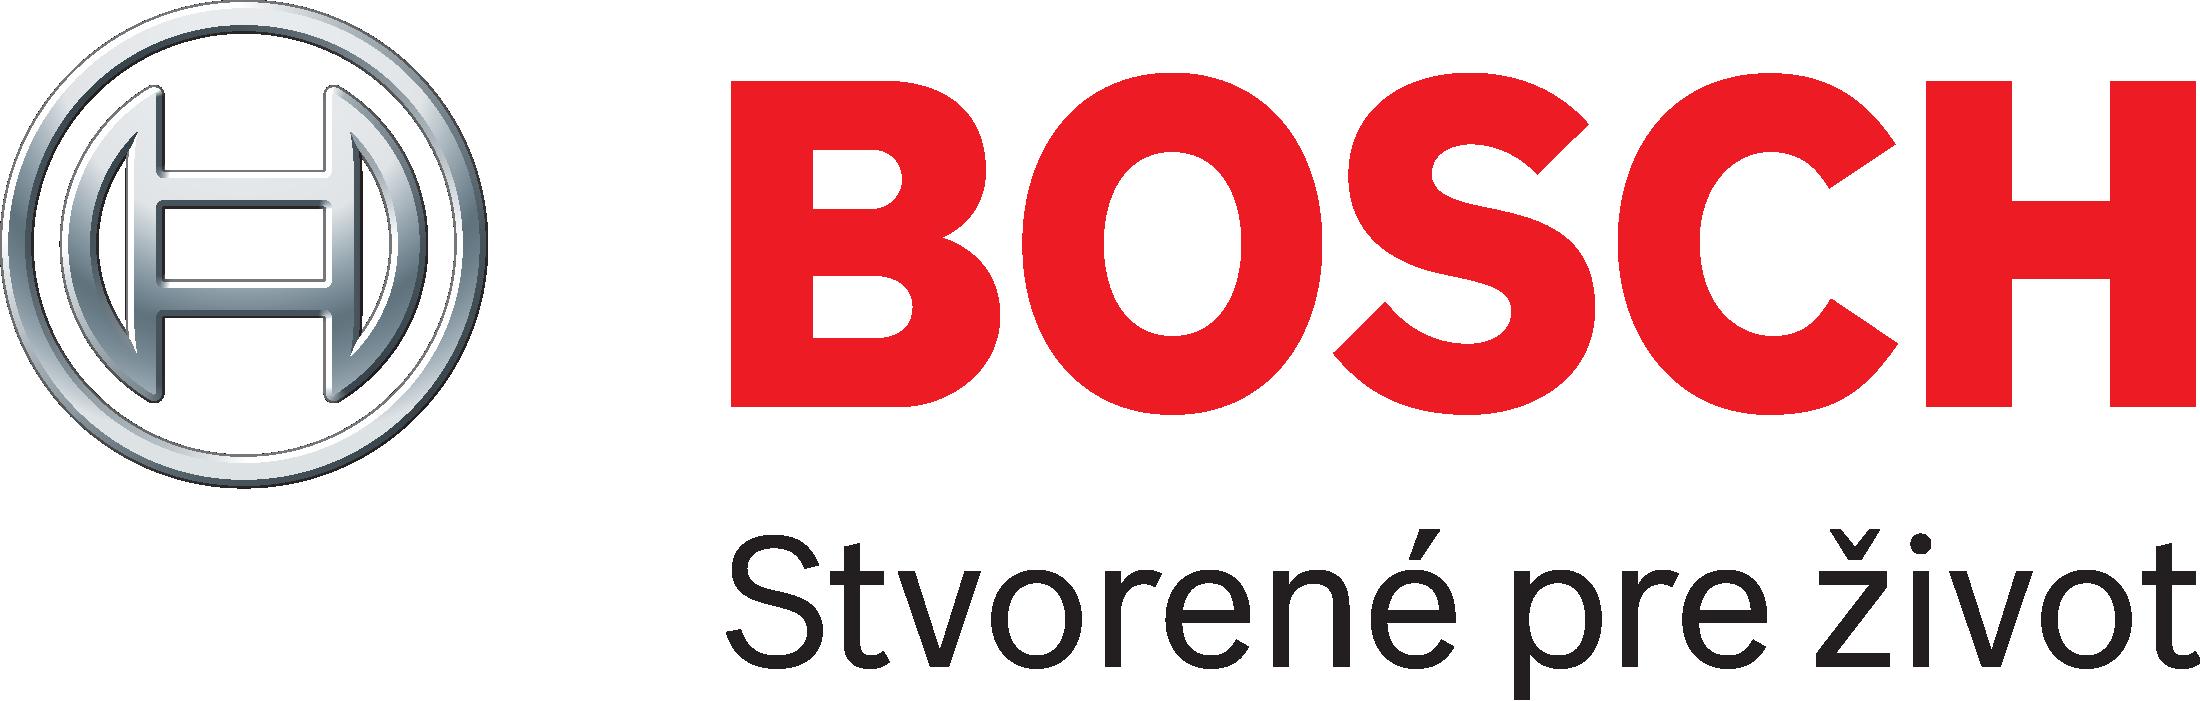 /images/com_odtatierkdunaju/teams/2017_We-are-Bosch.png